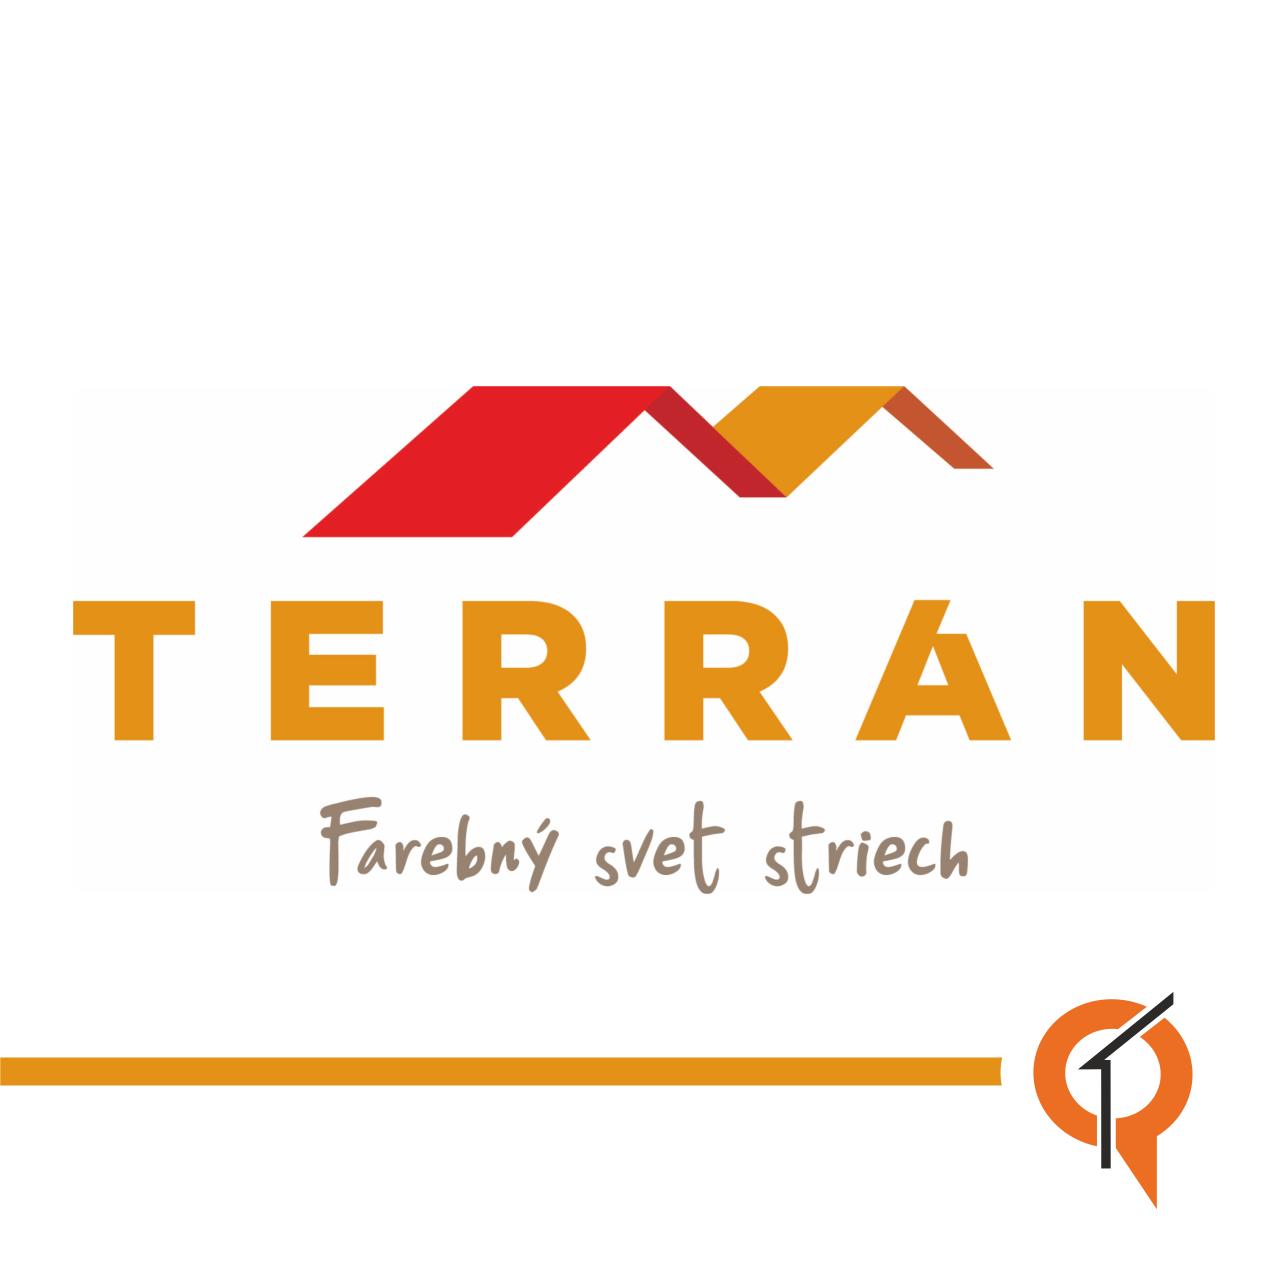 terran_qtrend_sikme_strechy